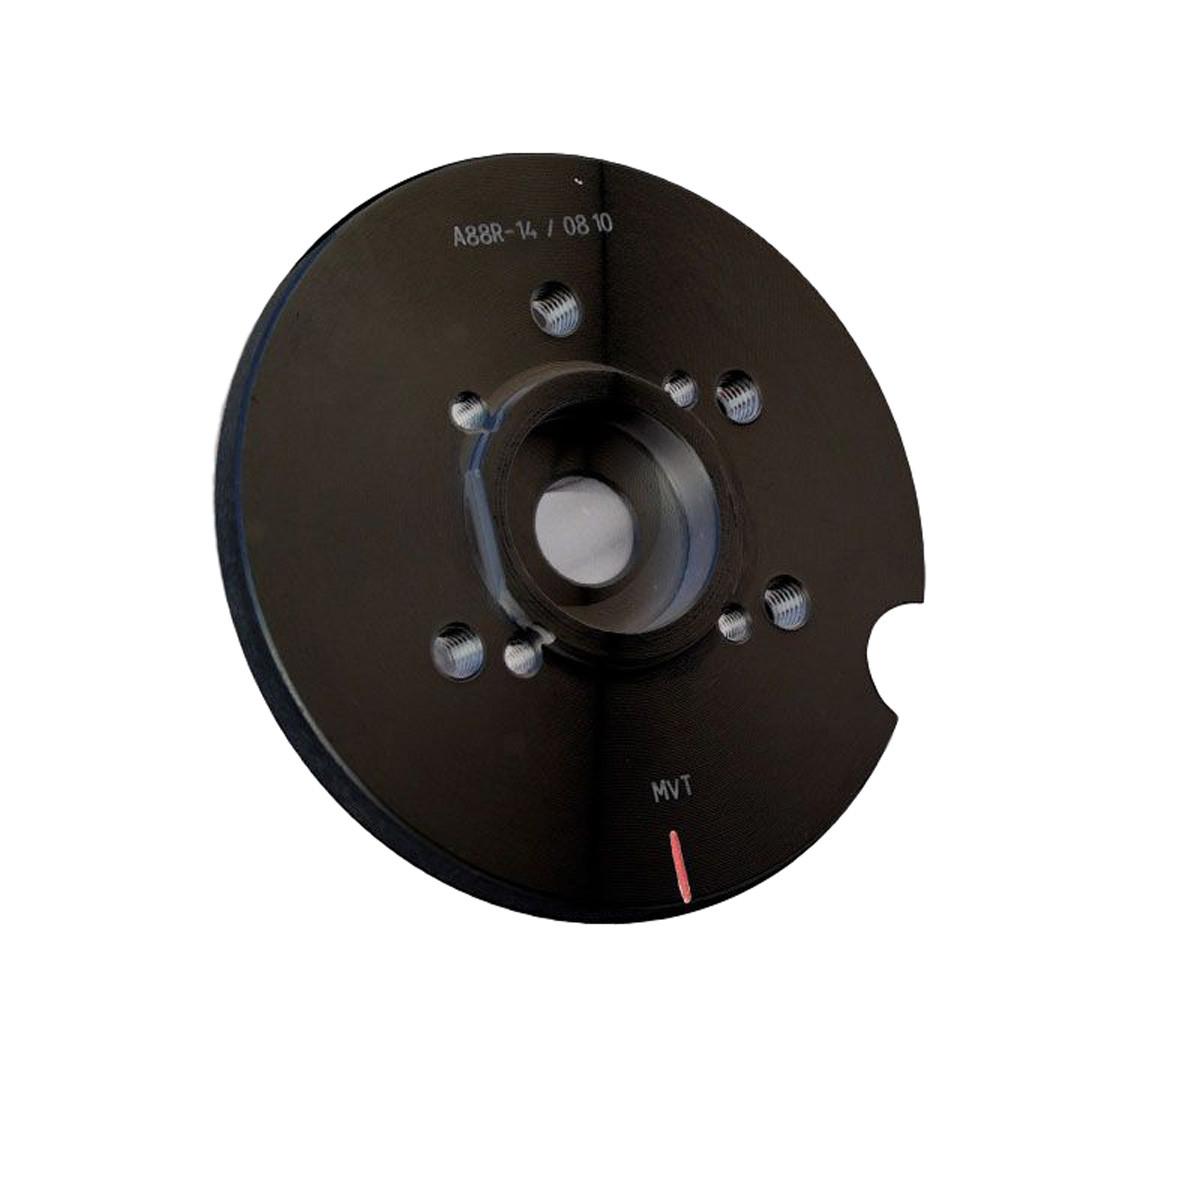 Rotor Allumage PEUGEOT Ludix - Jet Force - MVT Digital Direct DD10